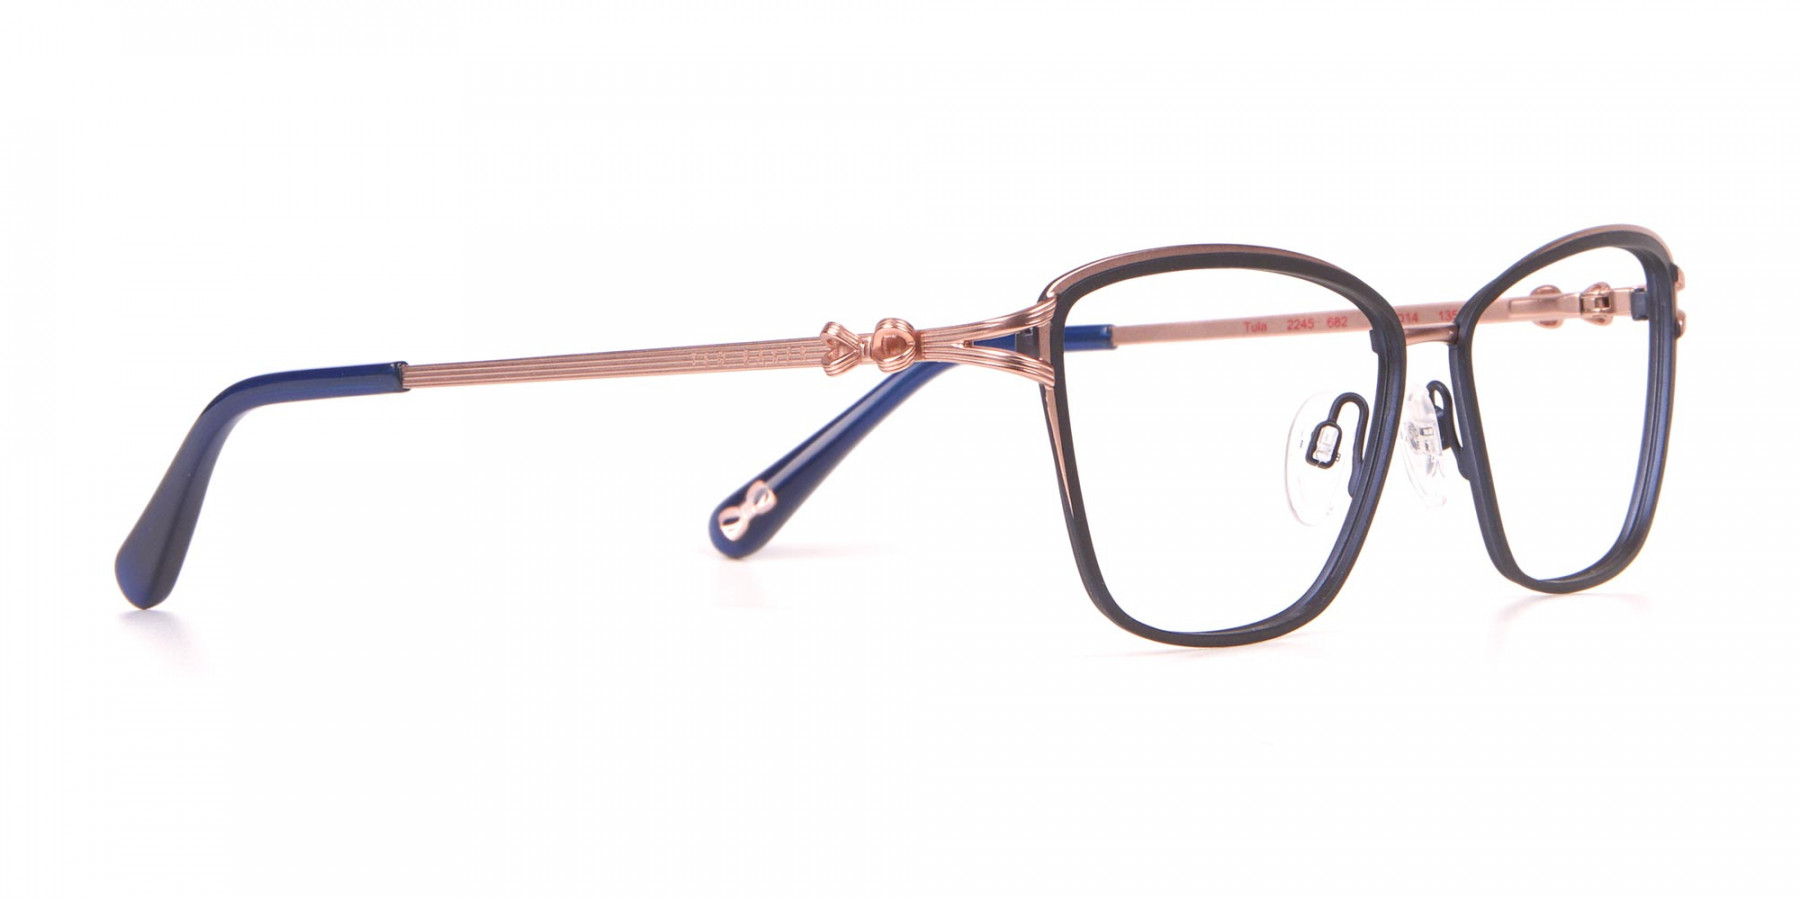 Ted Baker TB2245 Tula Women Classic Cateye Glasses Navy-1